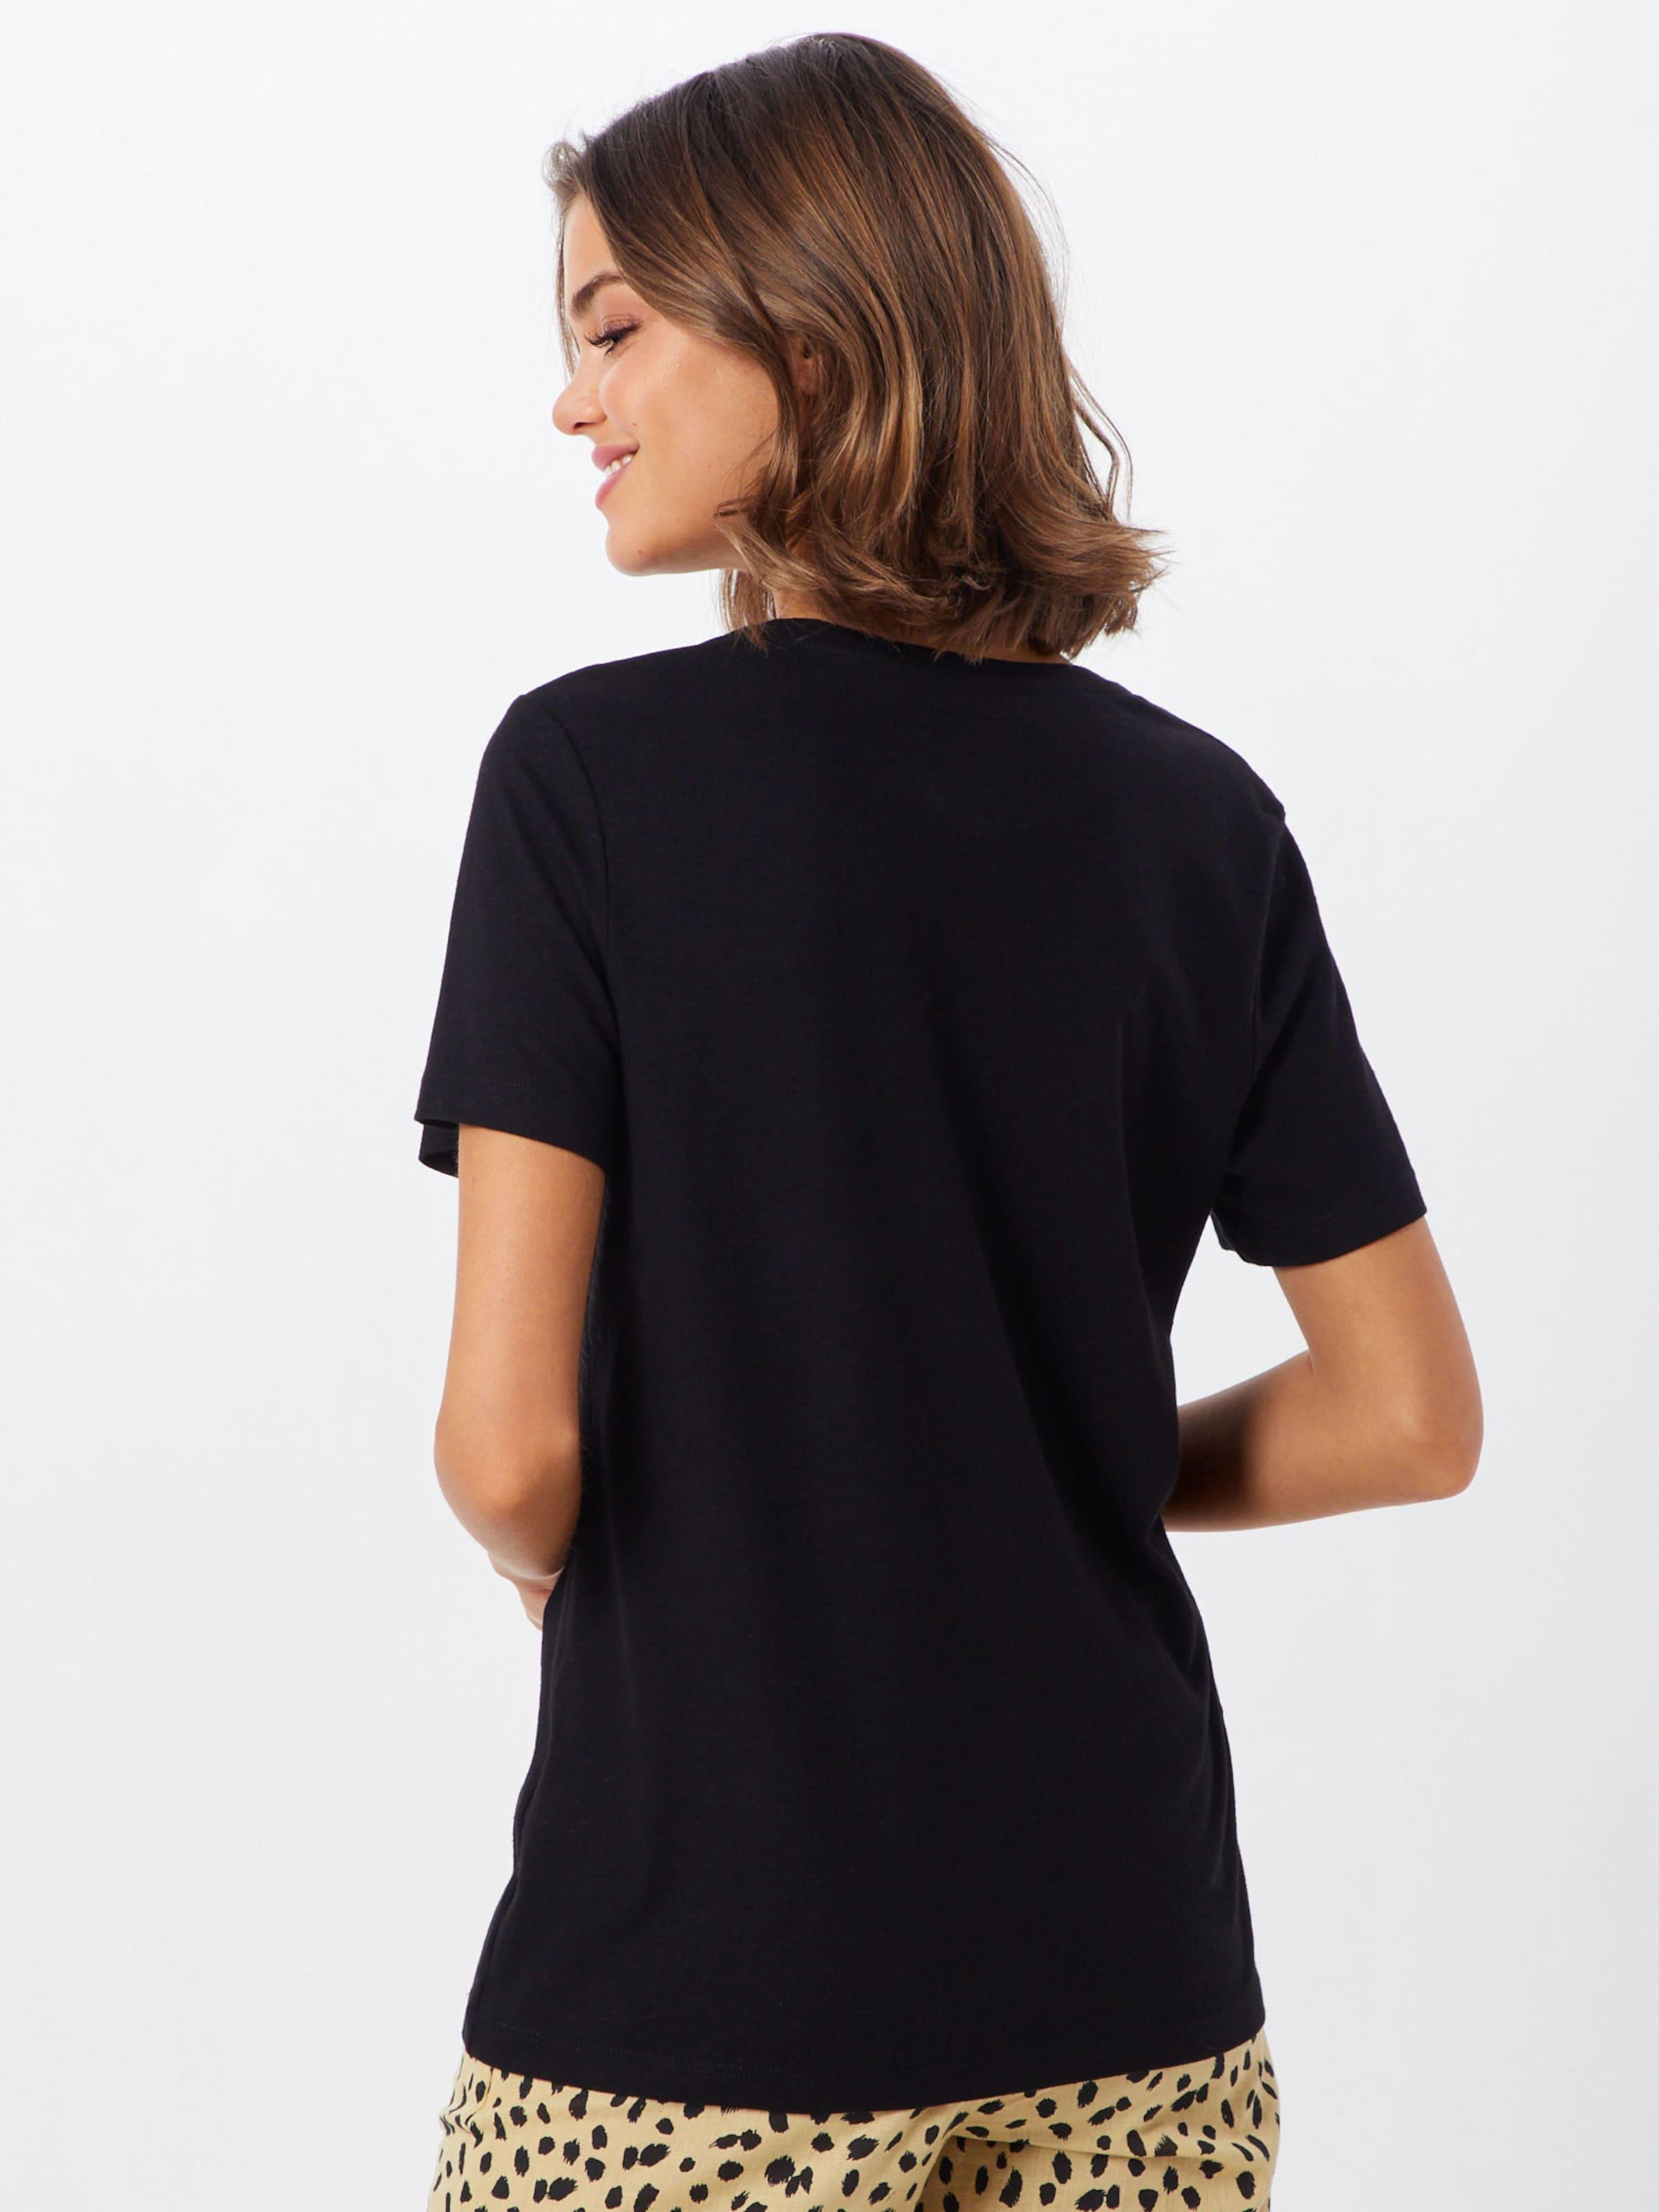 Shirt Superdry 'ol In Schwarz Essential' PkXZOiu